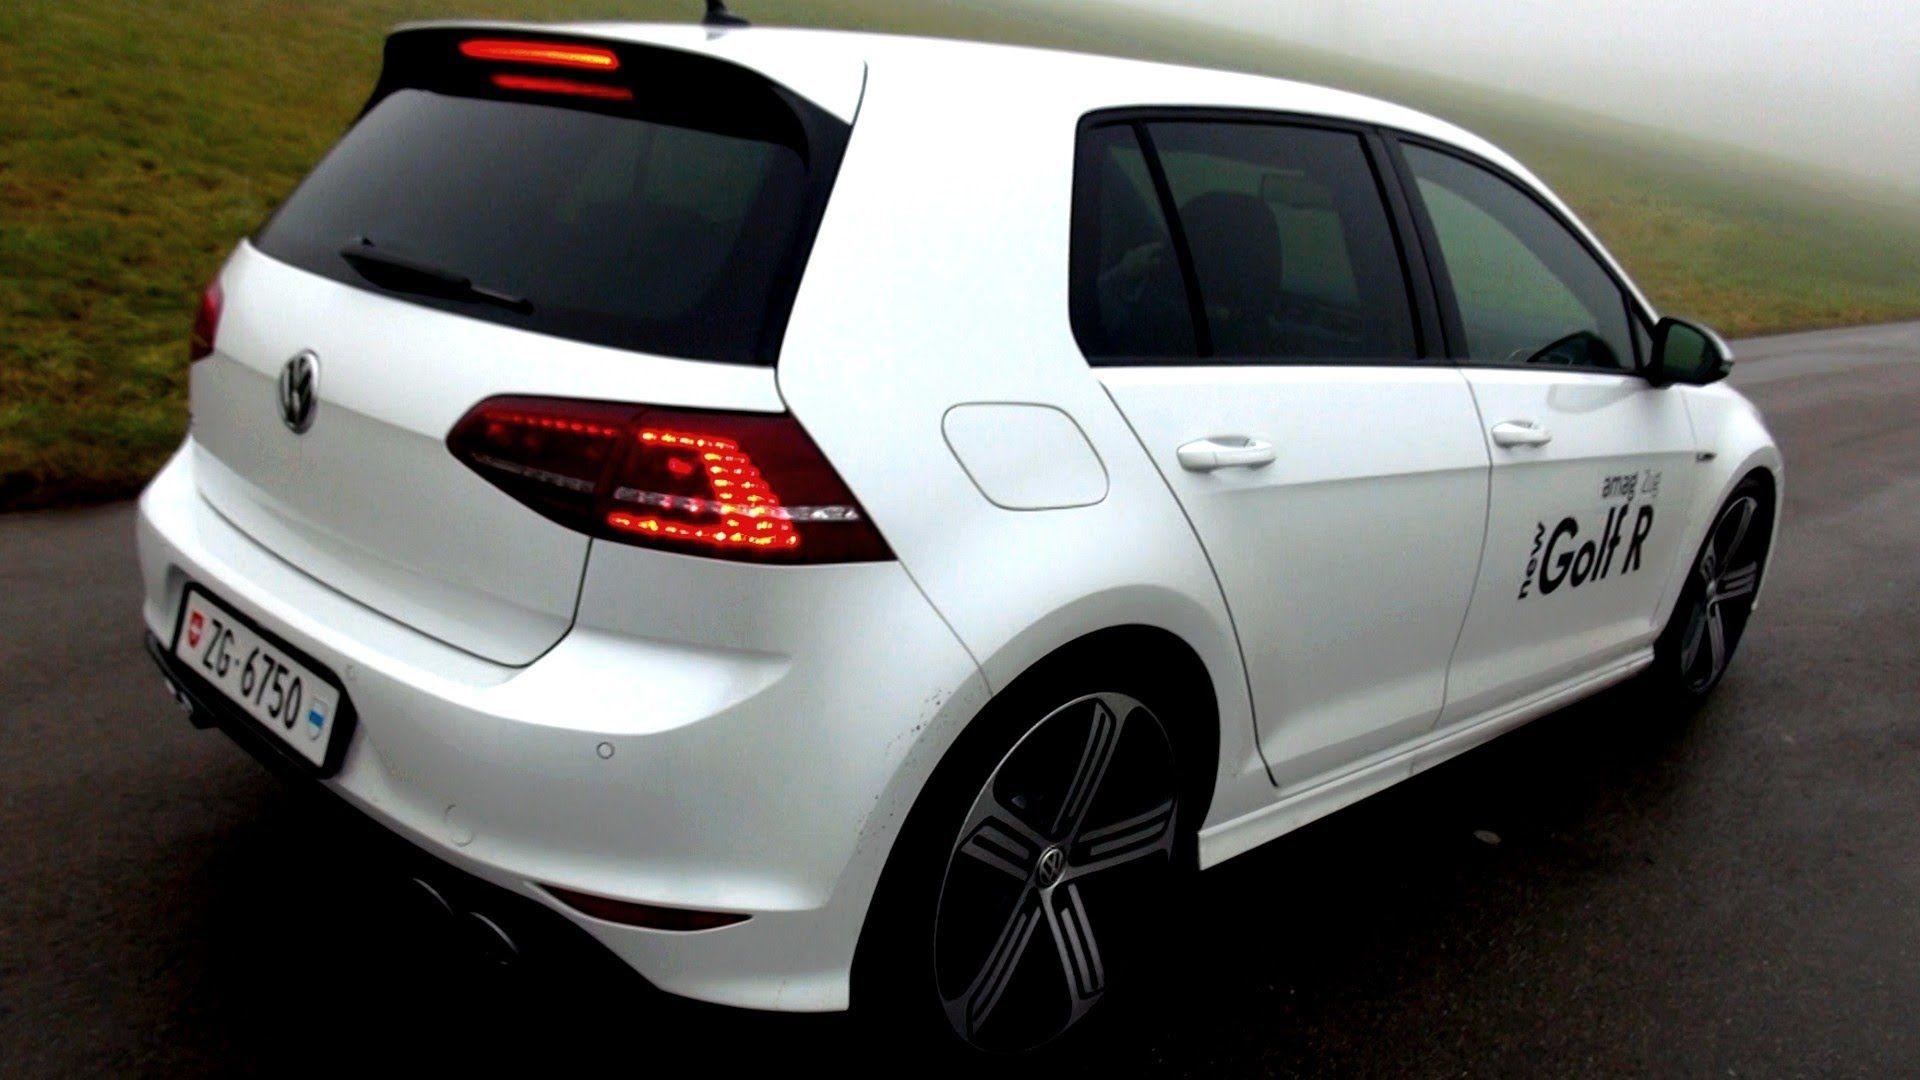 2014 vw golf 7 r test drive with 300 horsepower custom. Black Bedroom Furniture Sets. Home Design Ideas